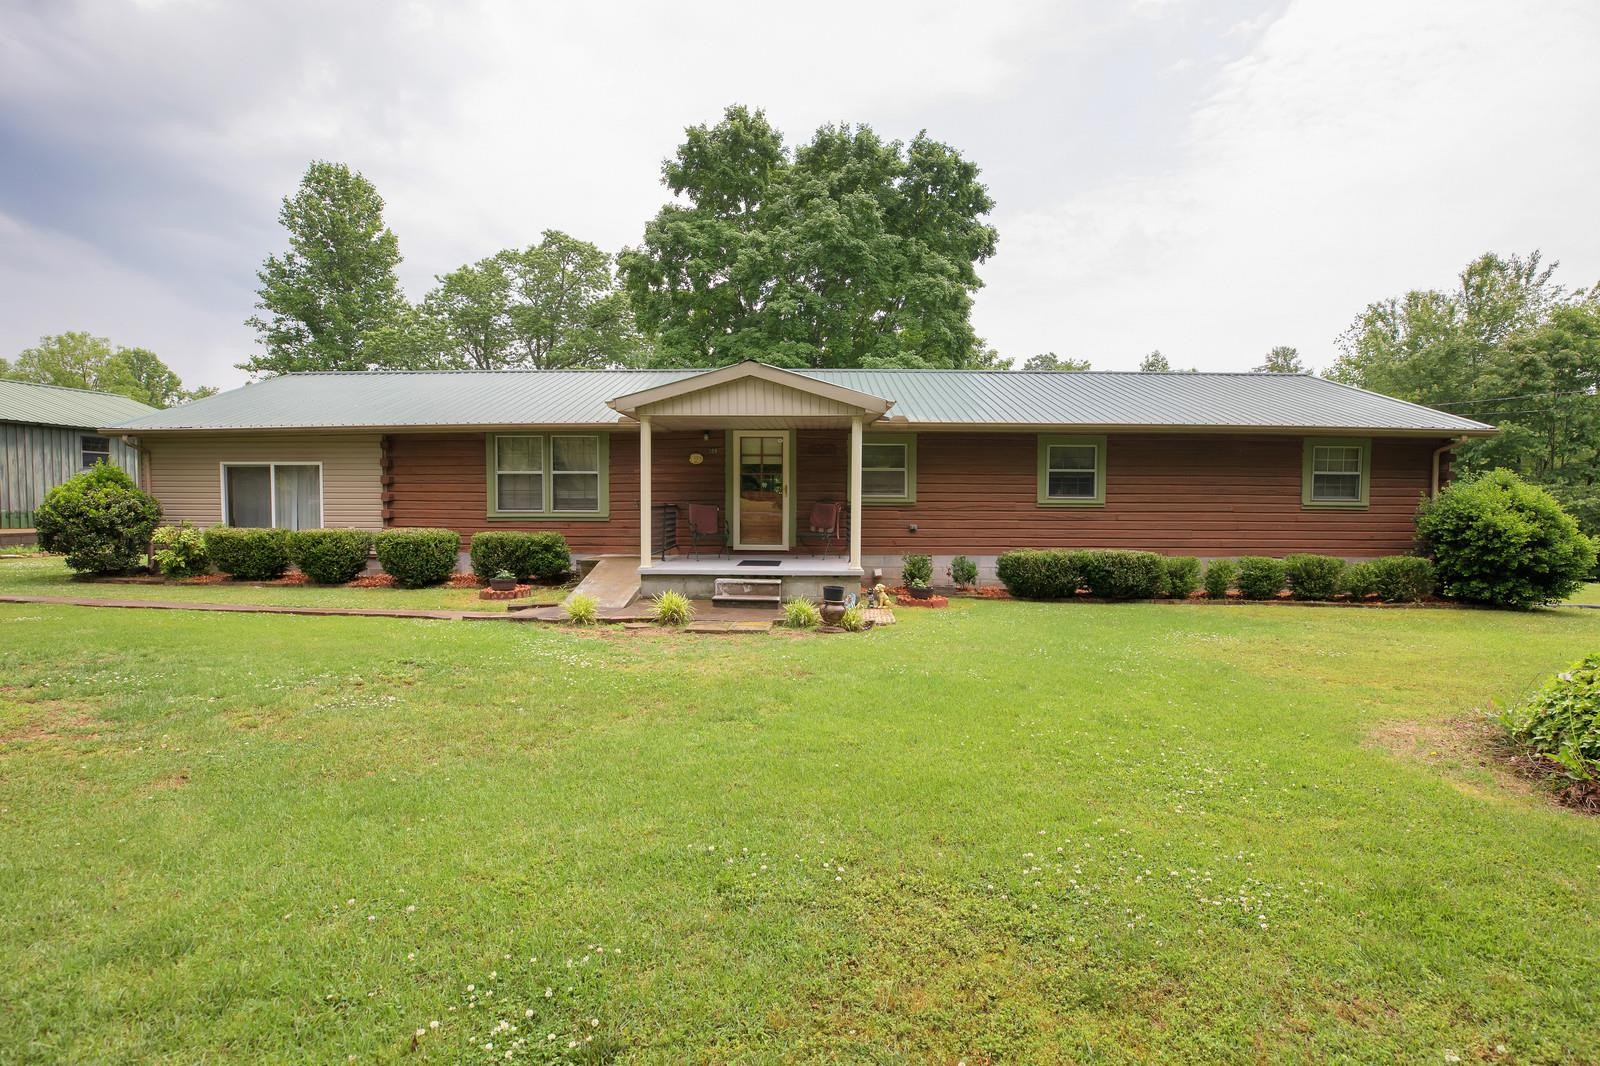 388 Chief Creek Rd Lawrenceburg, TN 38464